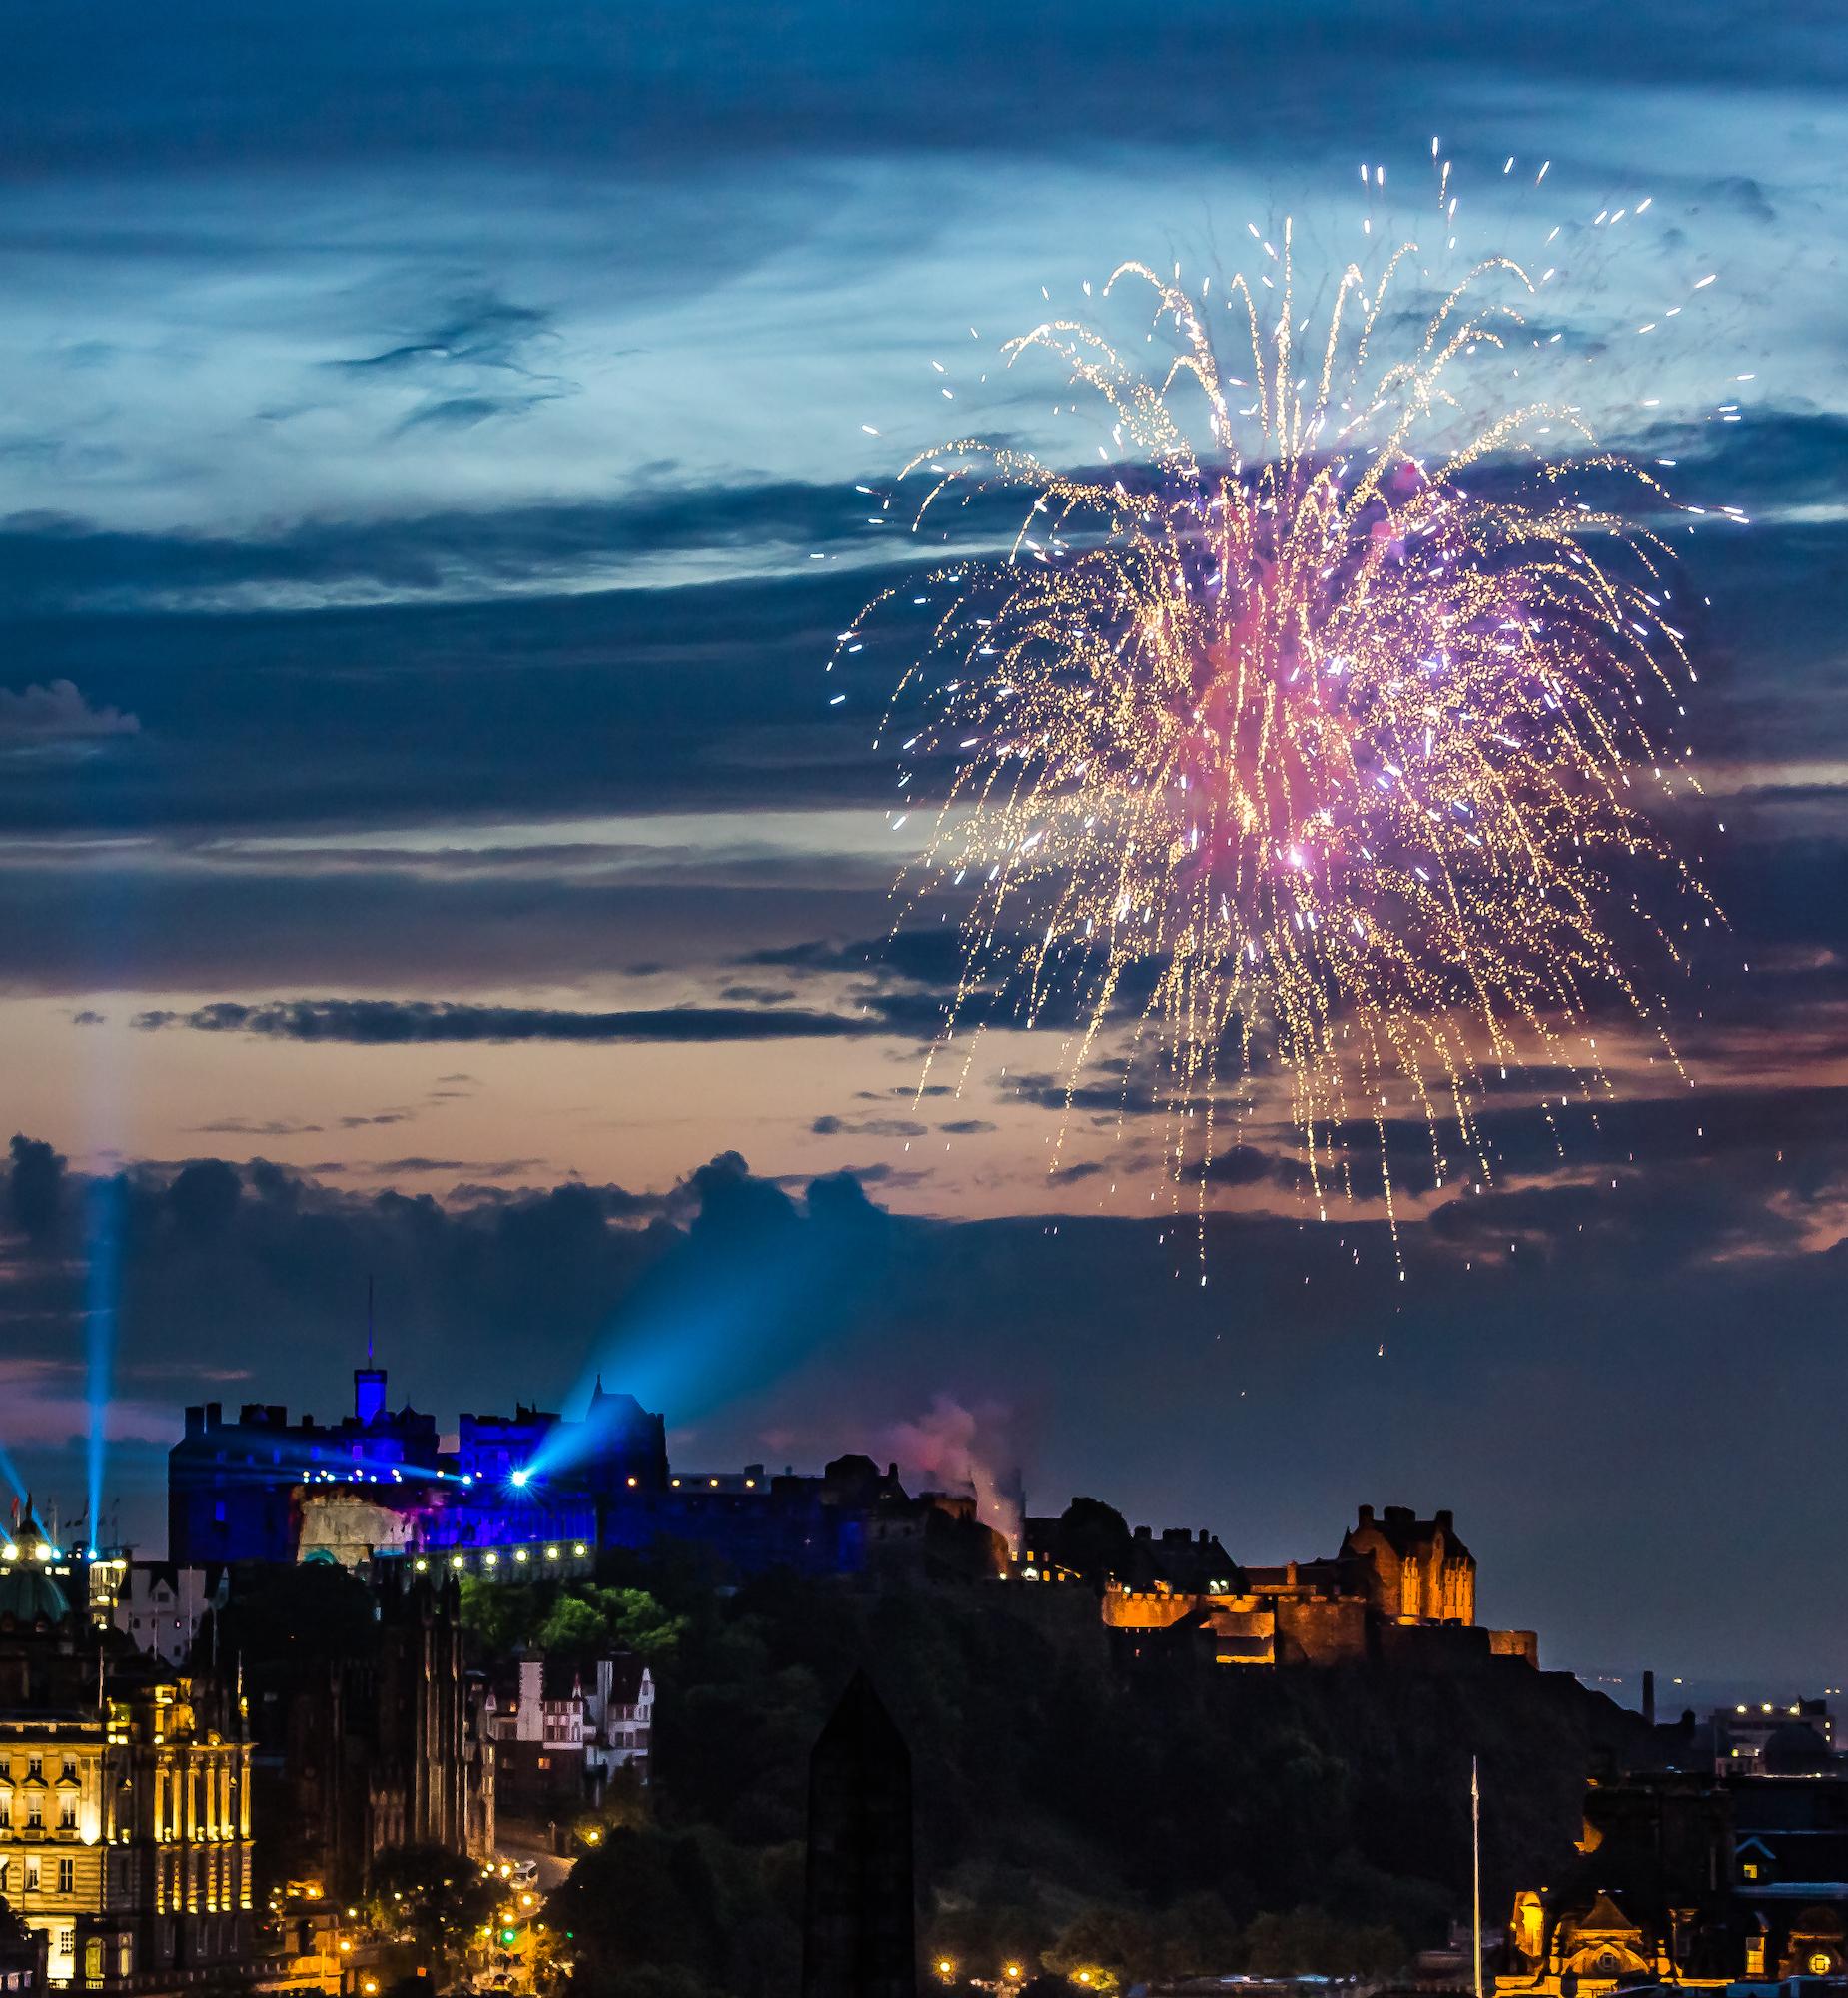 (563) Edinburgh Castle and Fireworks at The Royal Edinburgh Military Tattoo, Edinburgh, Scotland.jpg